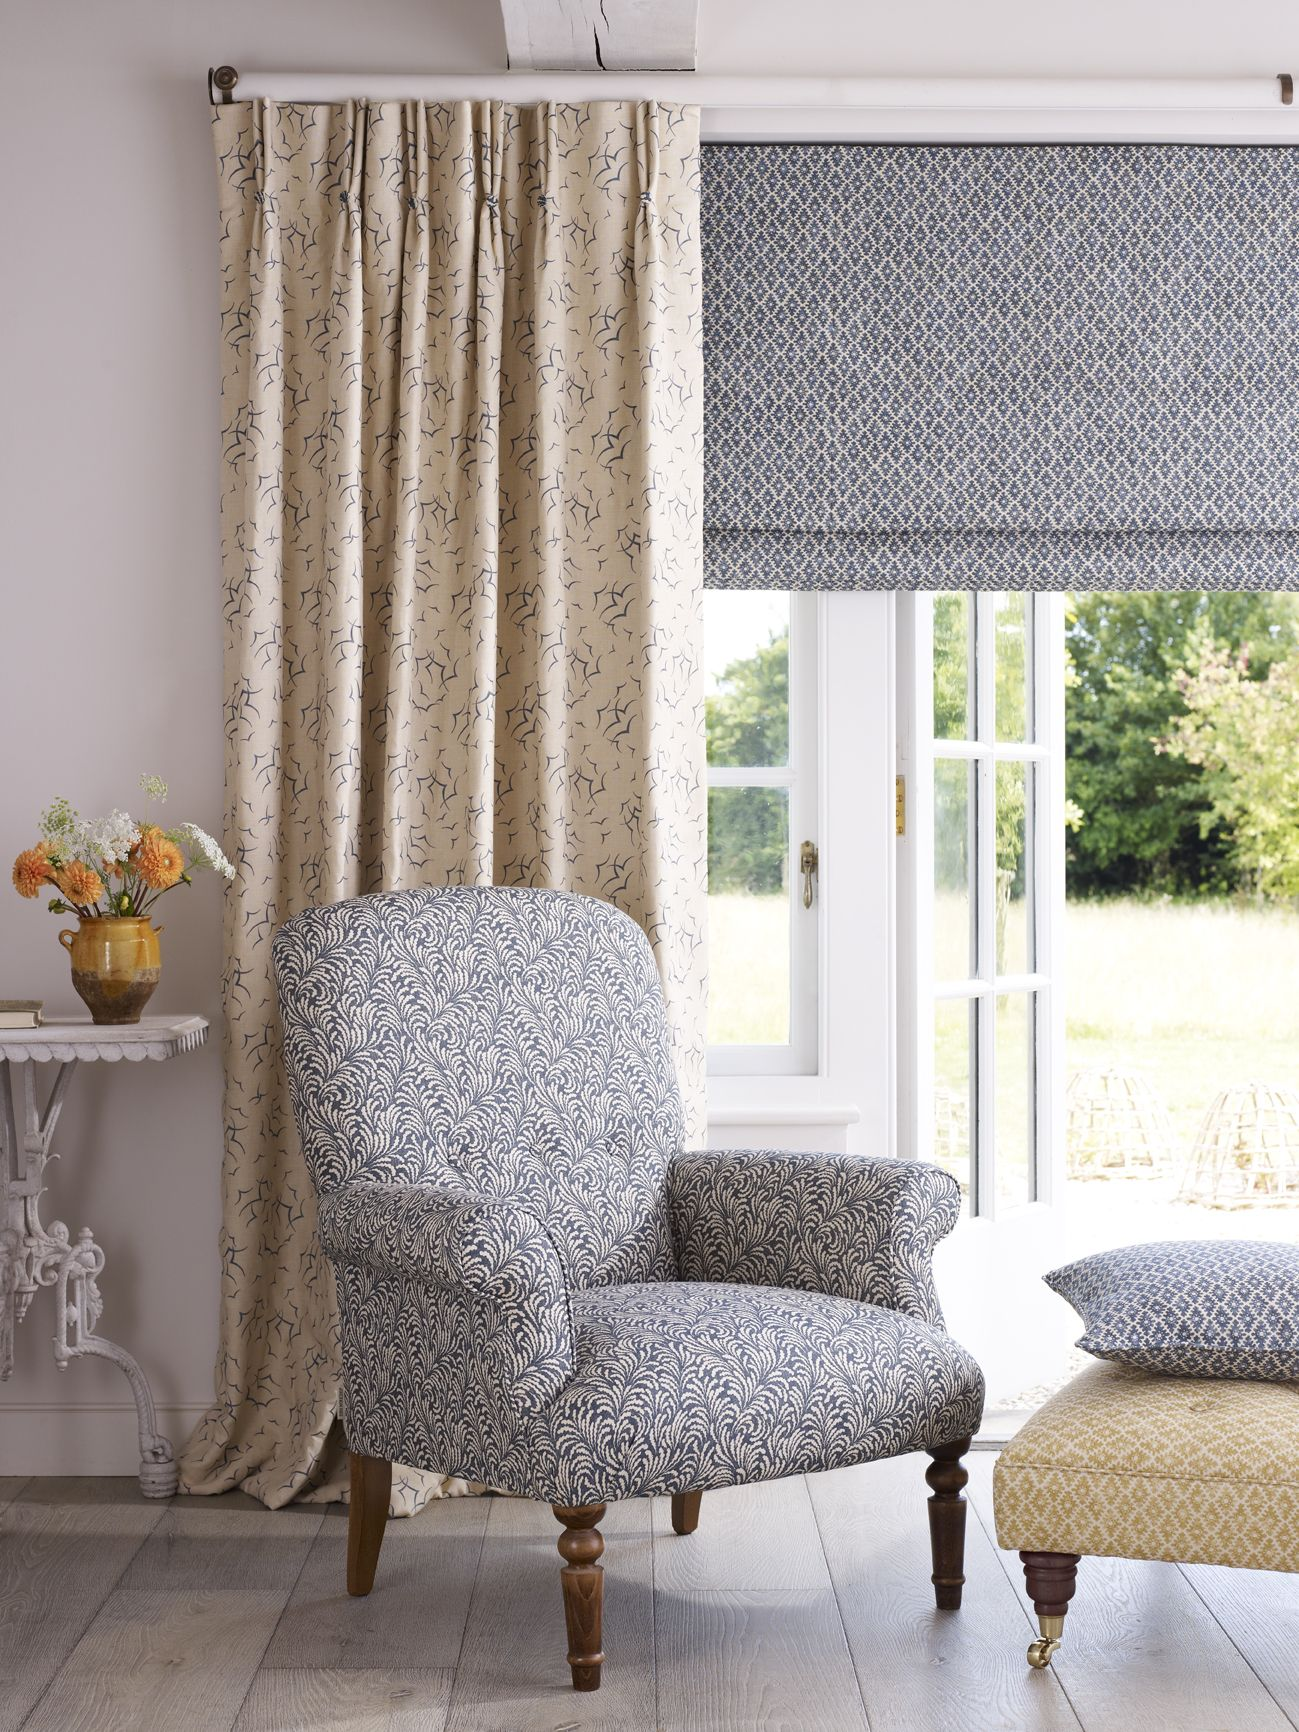 4 window curtain ideas  the whitewood range has a real crisp fresh feel to it imagine an